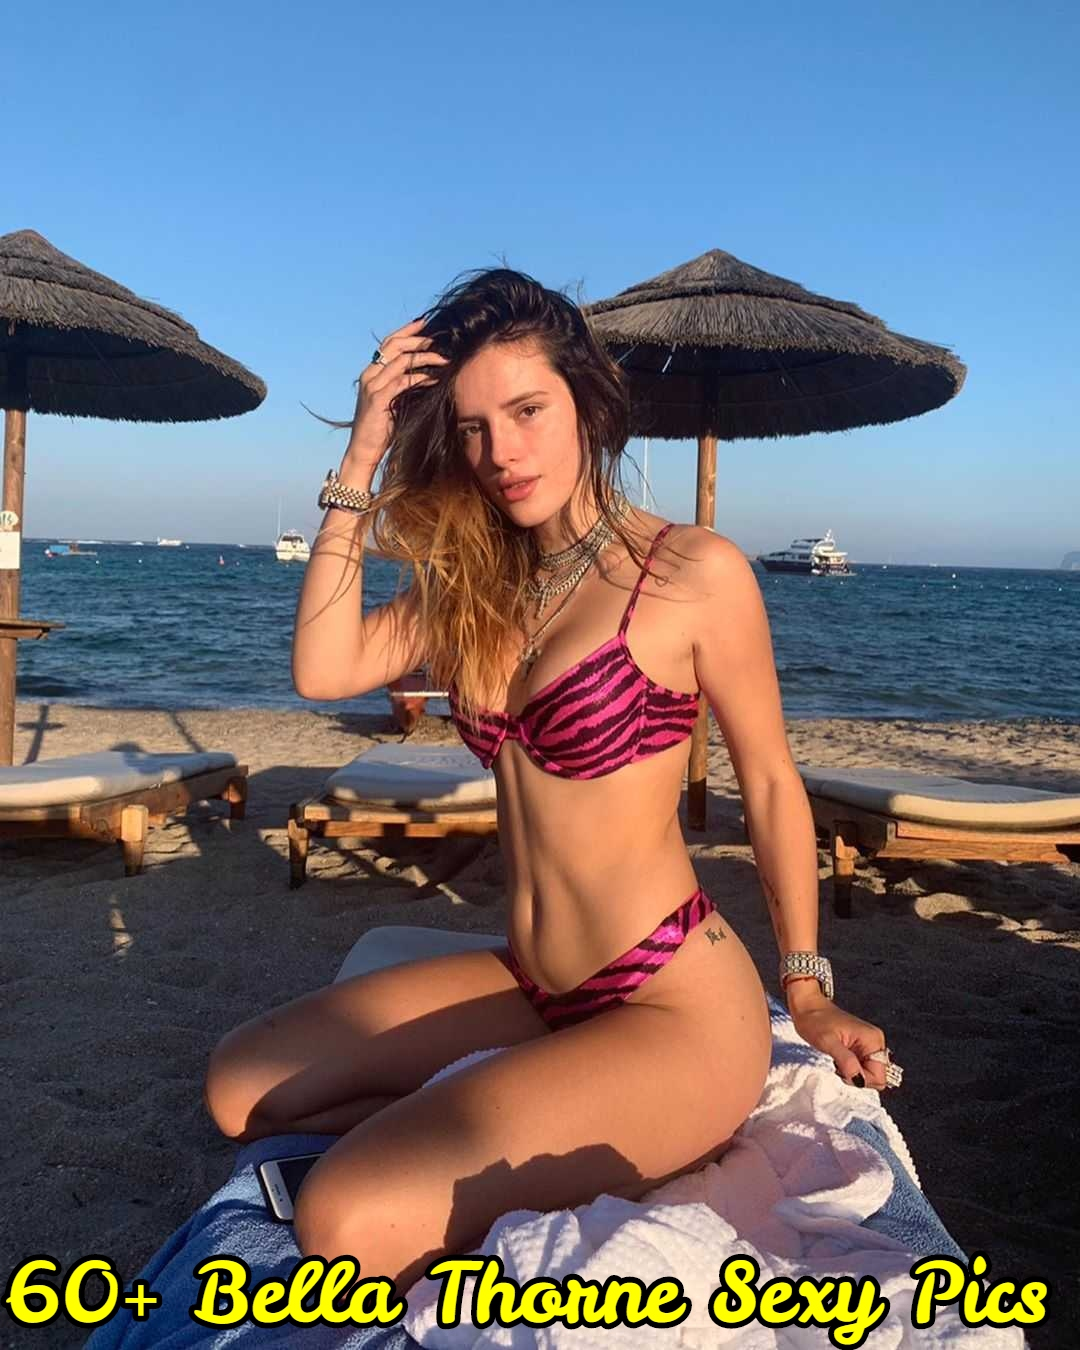 Bella-Thorne-sexy-bikini-pics-2